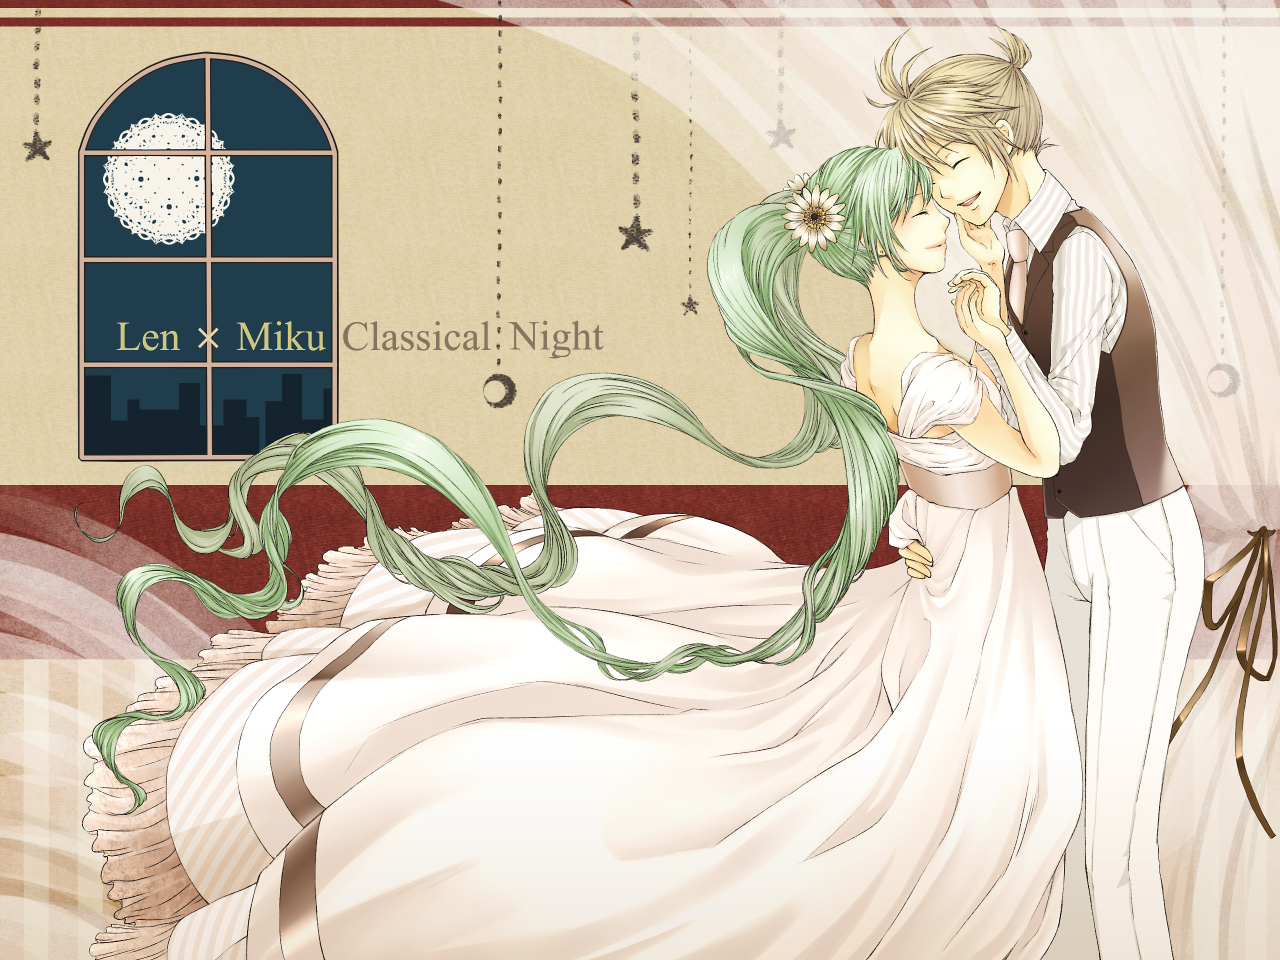 aliasing blonde_hair dress flowers fuusha green_hair hatsune_miku kagamine_len male night ponytail twintails vocaloid